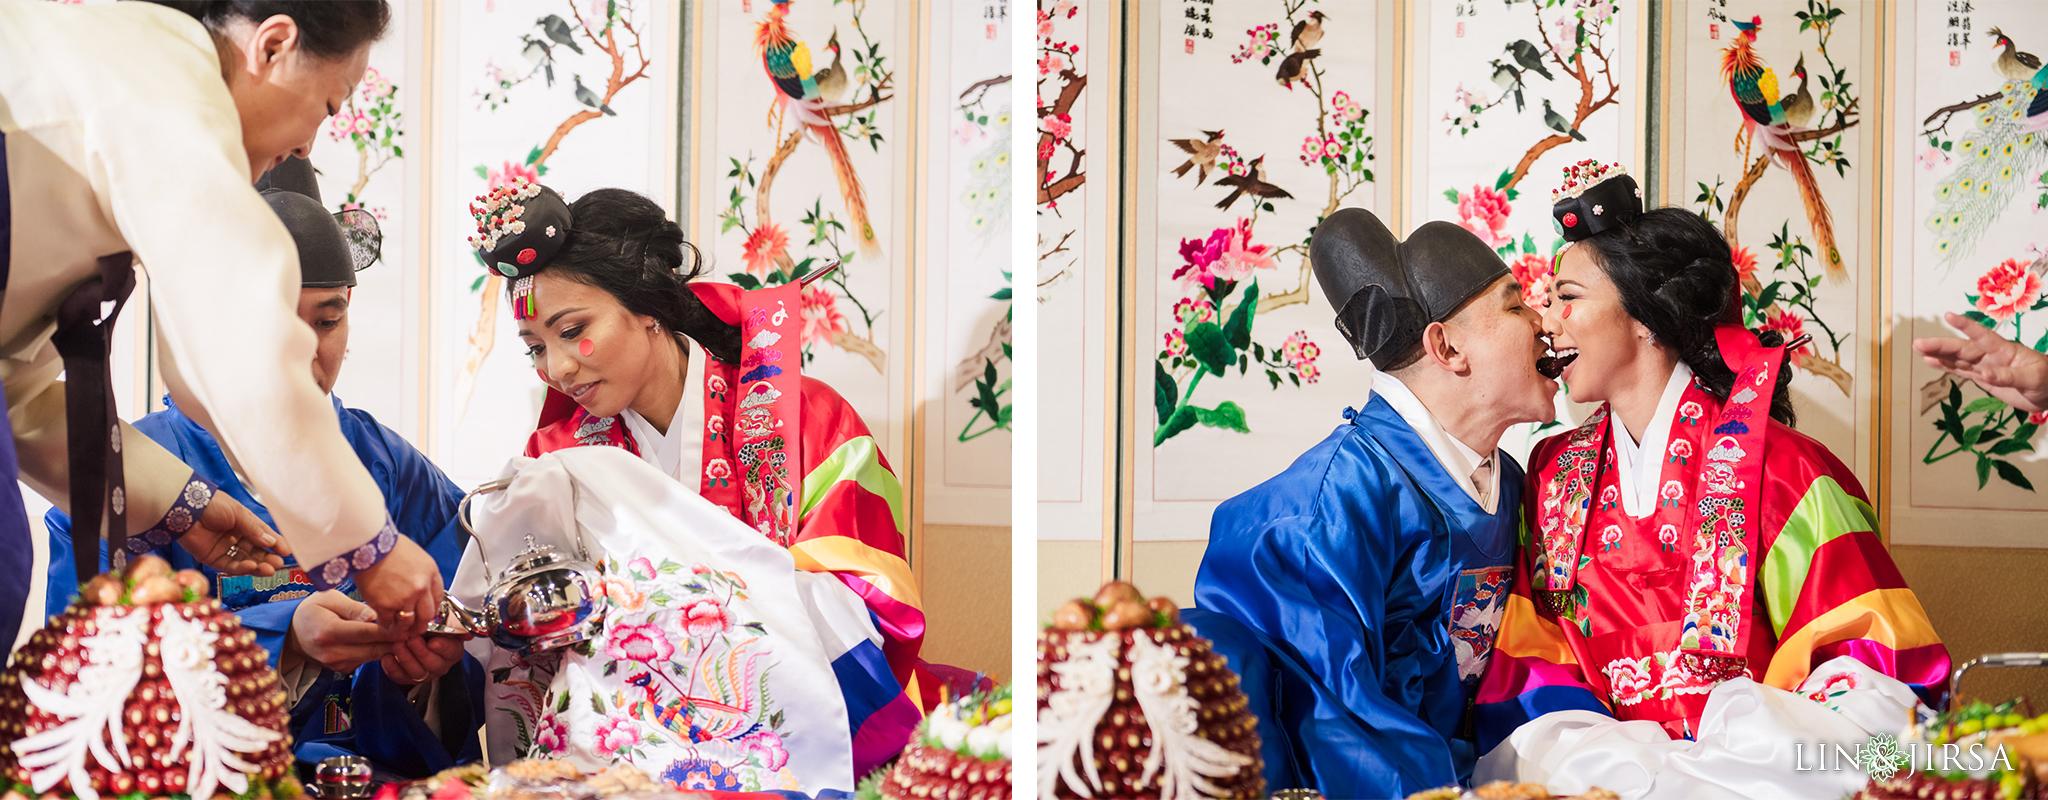 25 Business Expo Center Orange County Korean Wedding Ceremony Photography